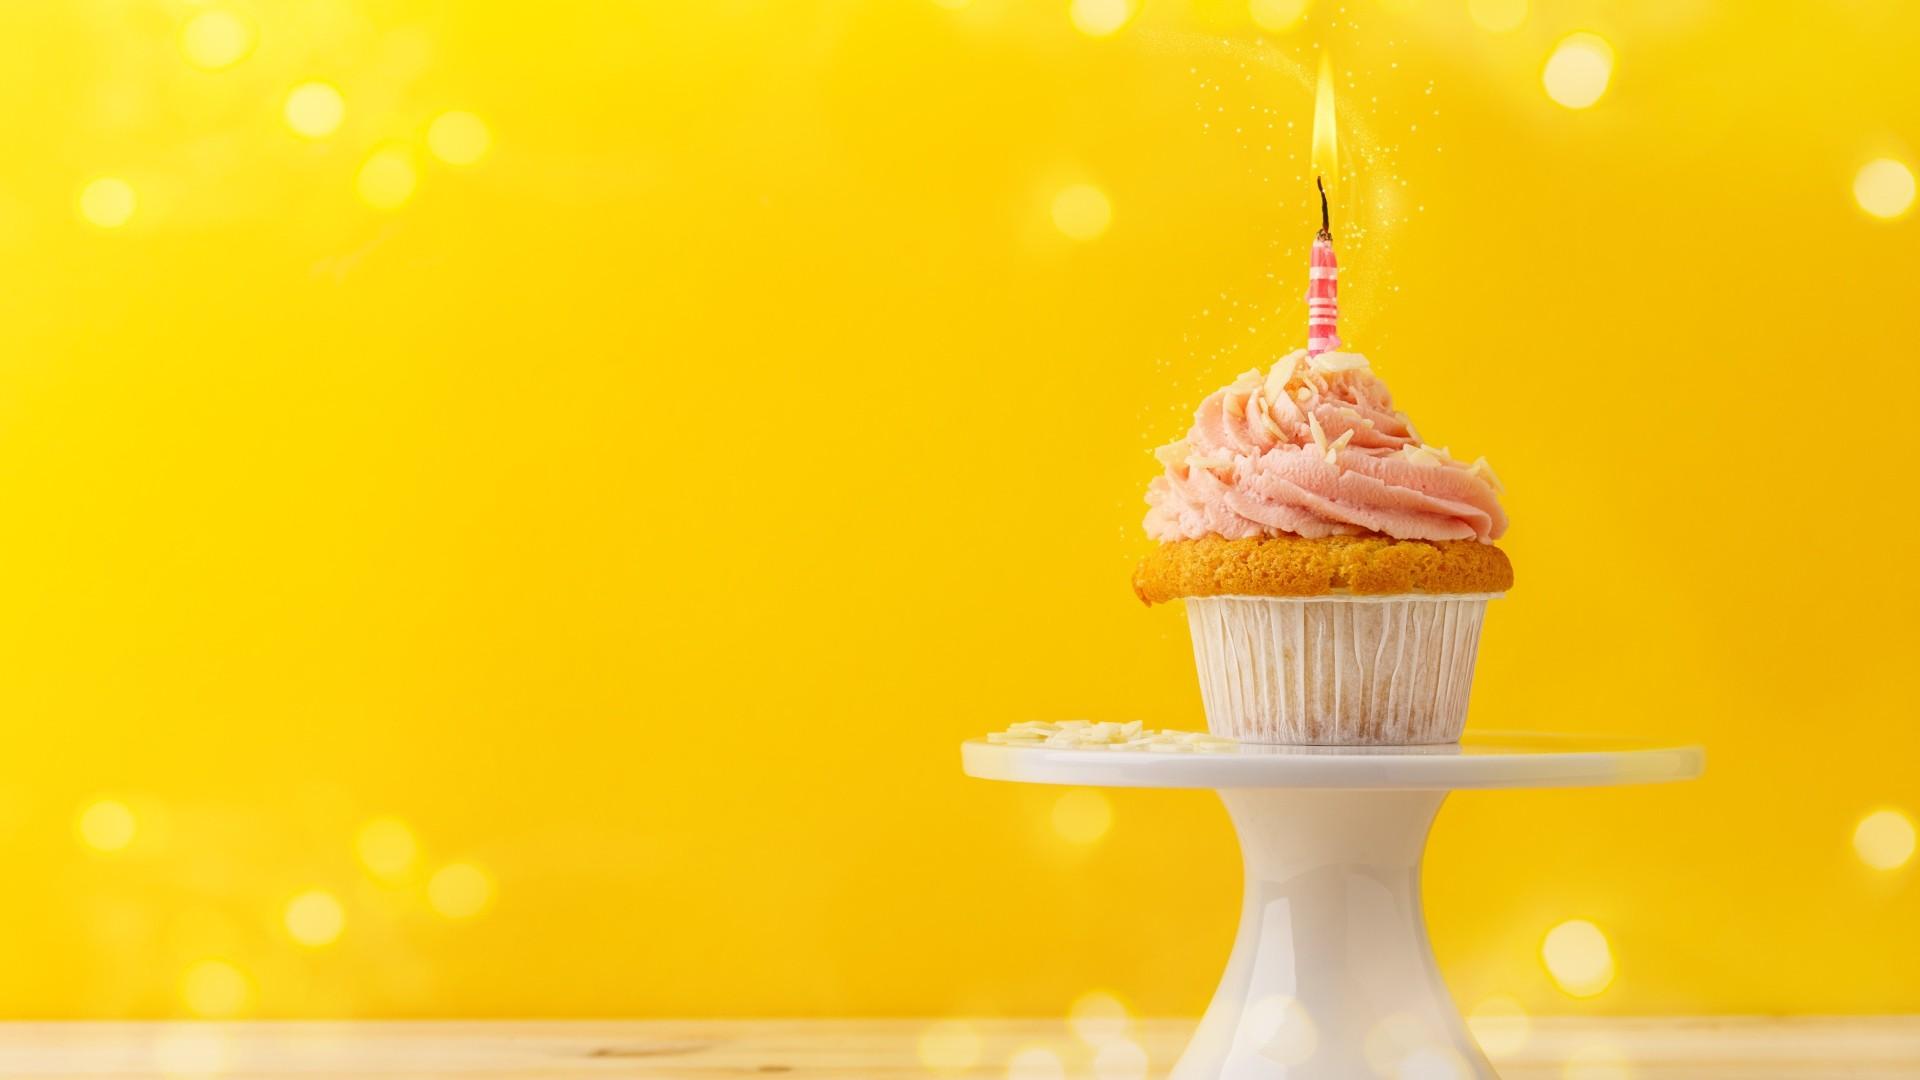 Birthday Cake desktop background free